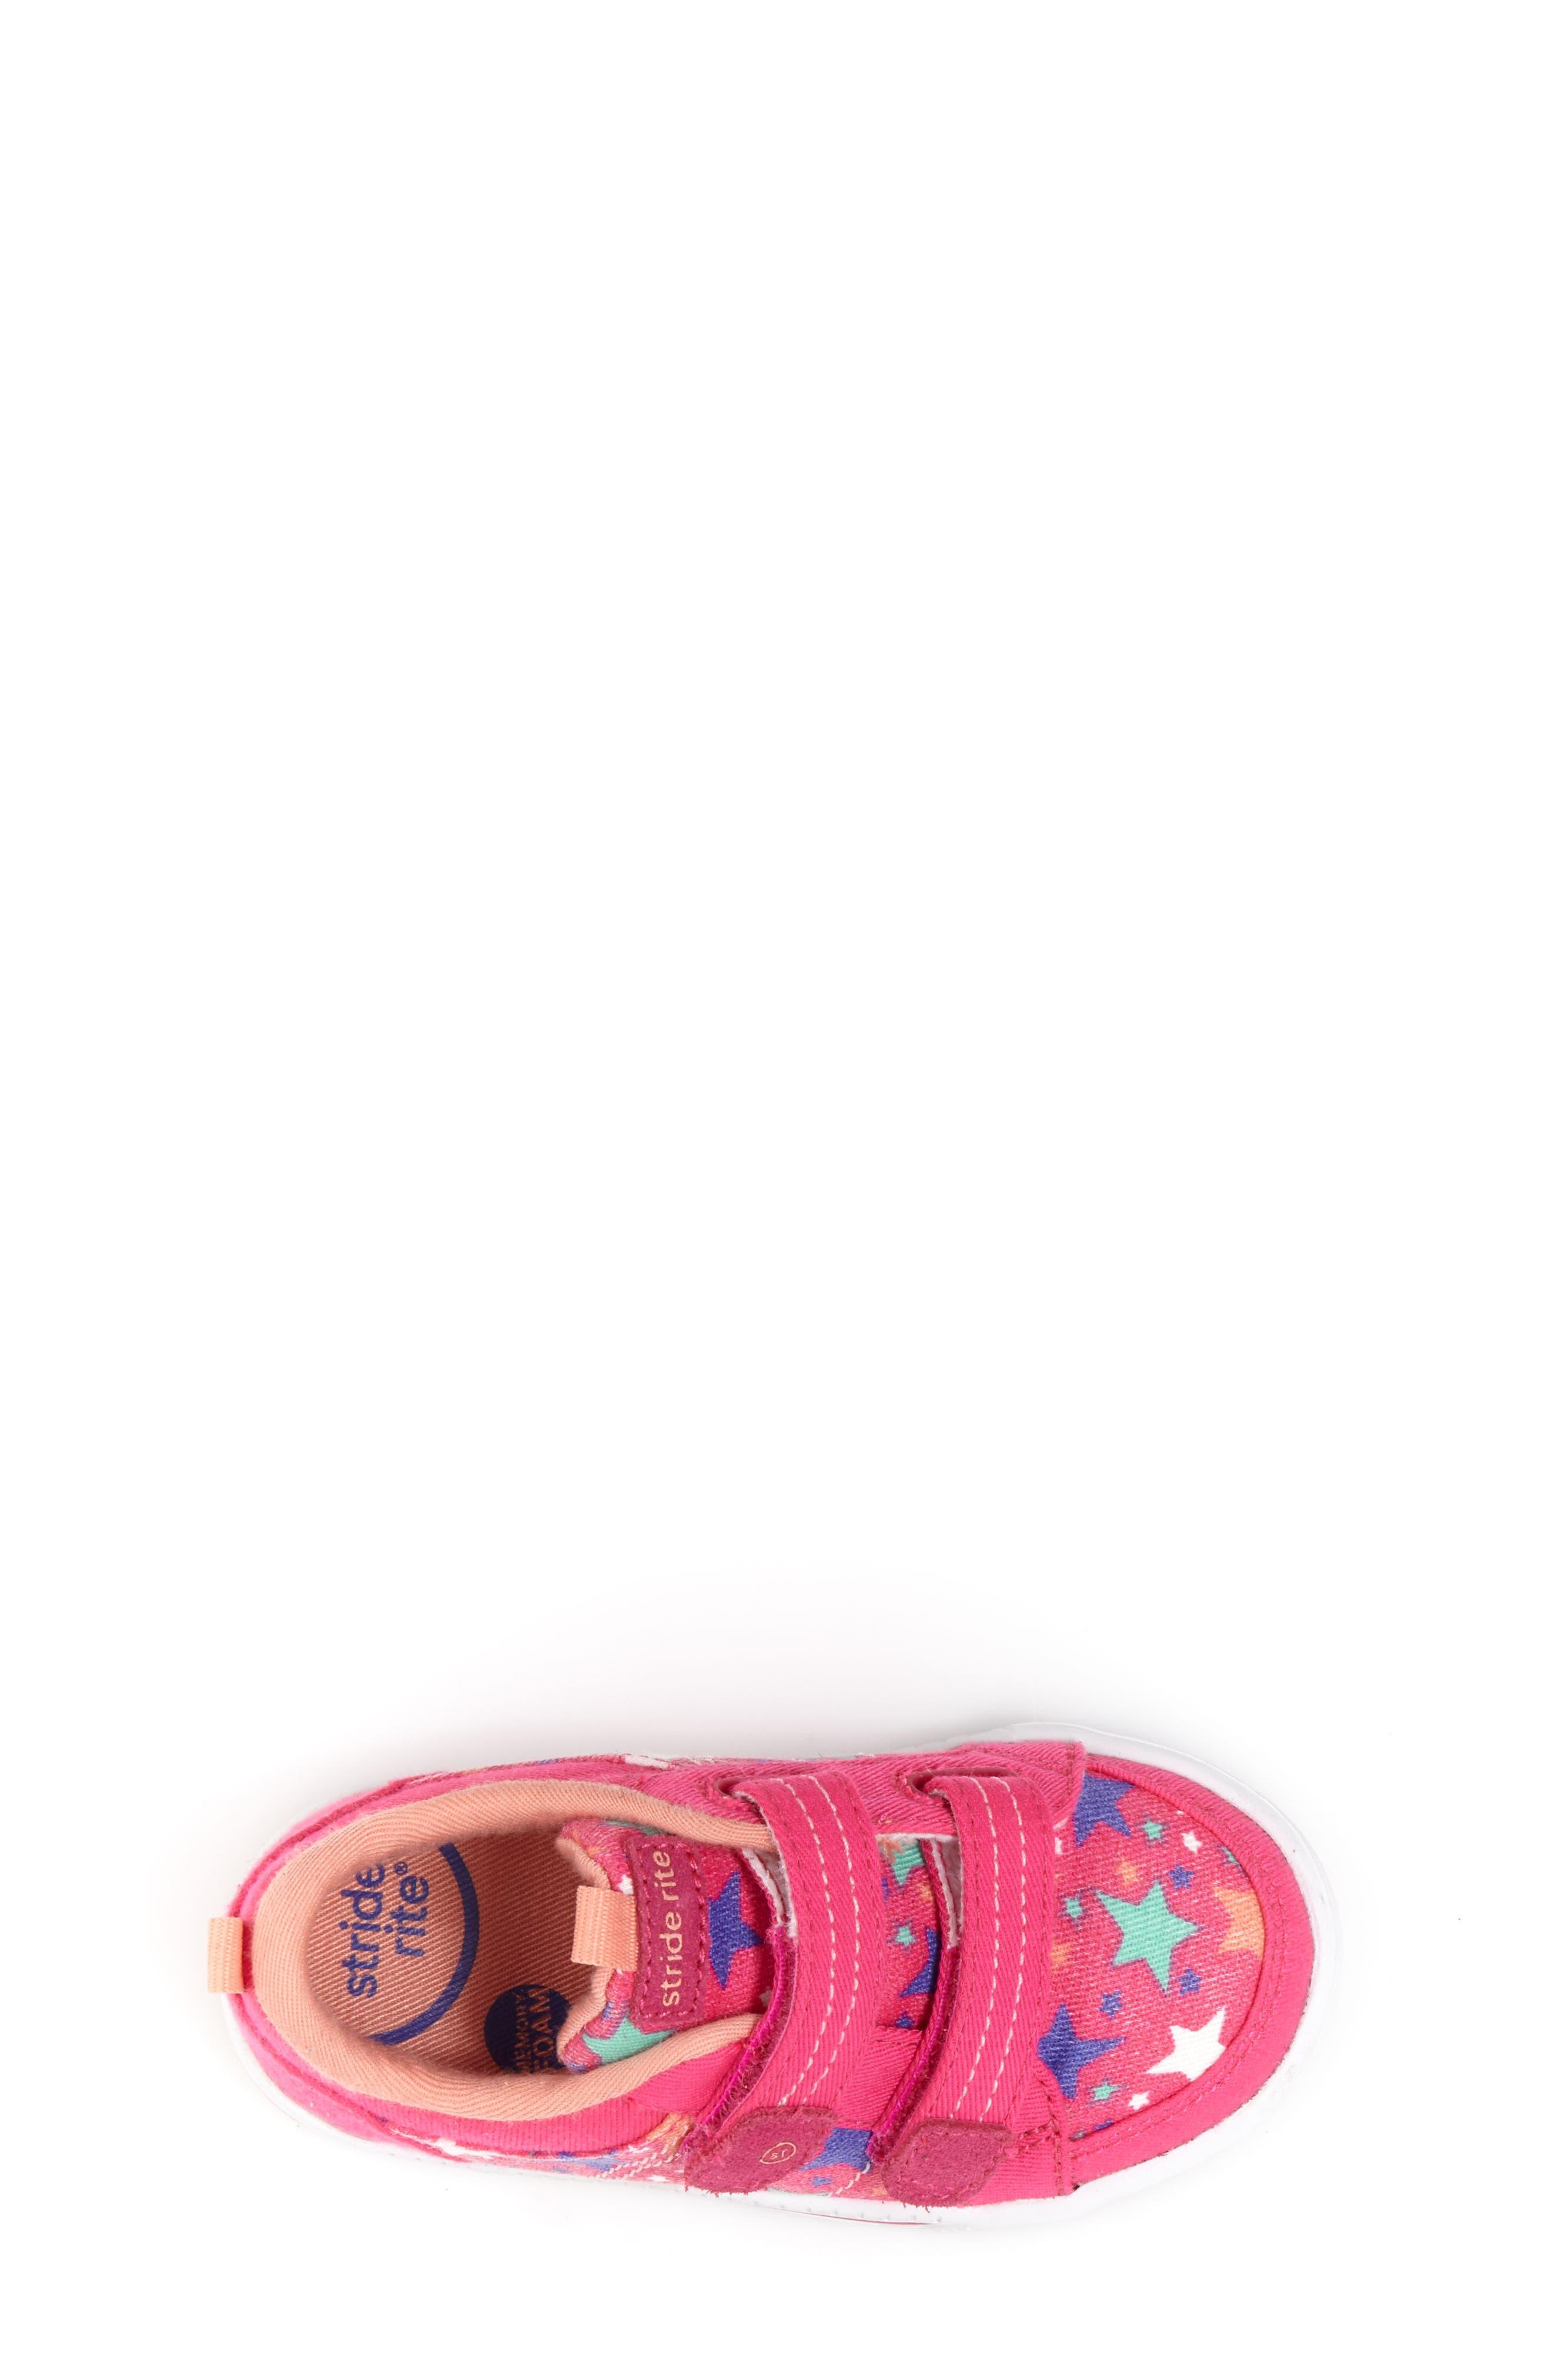 Logan Patterned Sneaker,                             Alternate thumbnail 5, color,                             650